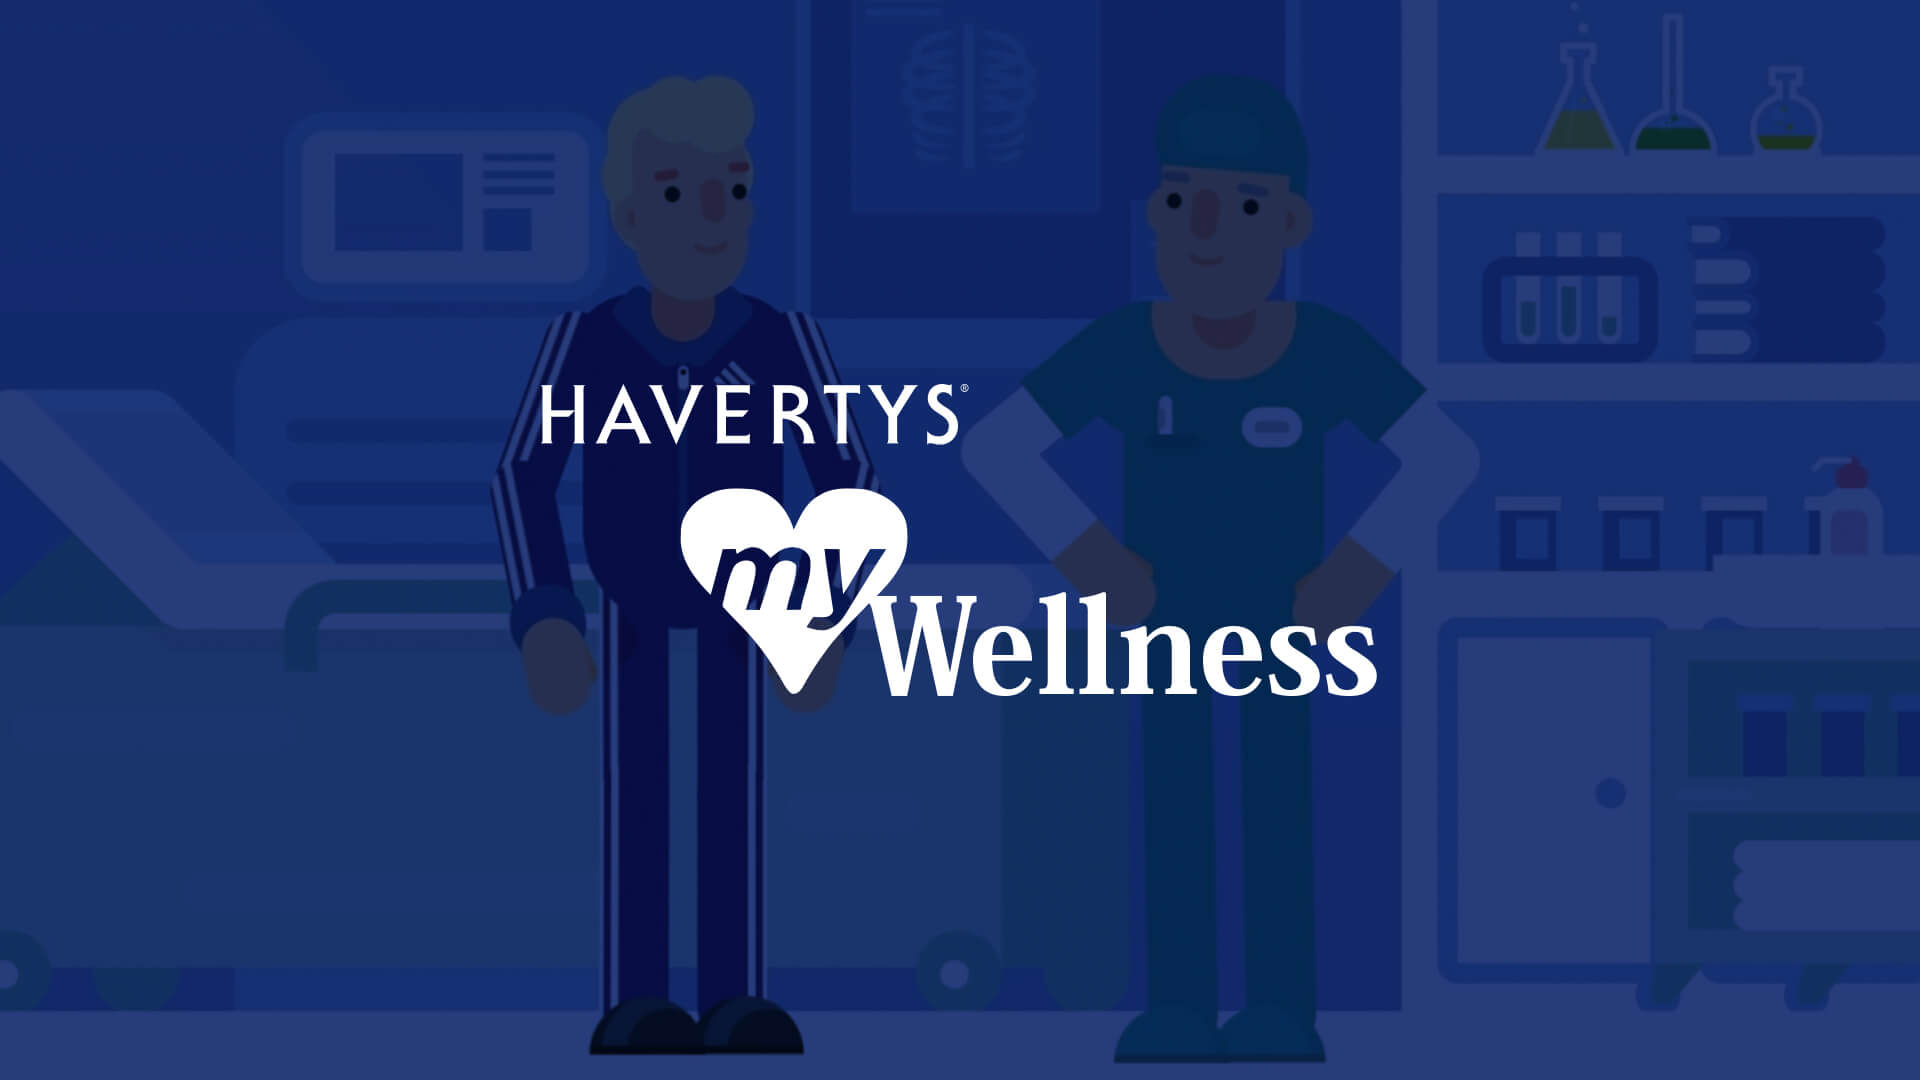 Havertys My Wellness Video